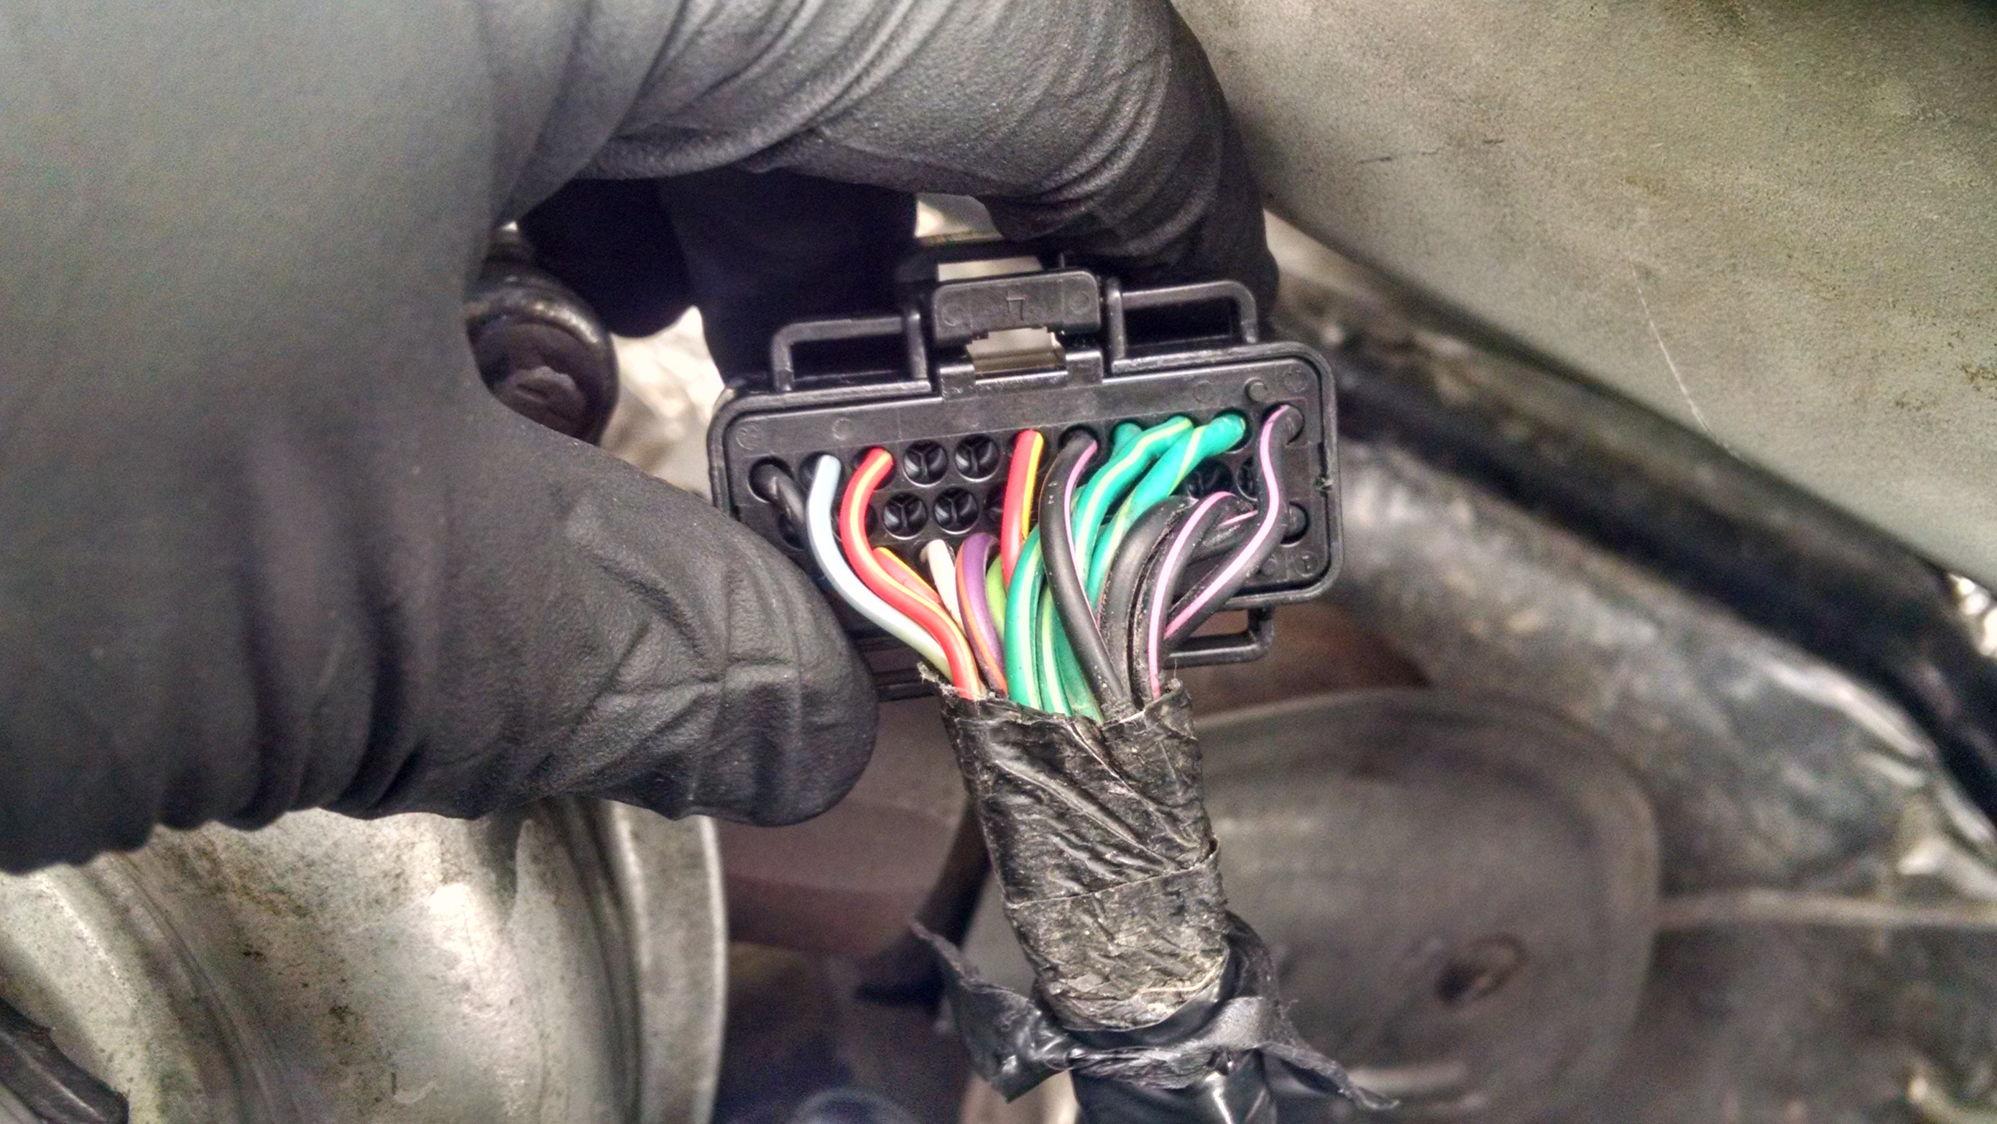 456 Ford Ficm Wiring Diagram 04 Wiring Resources